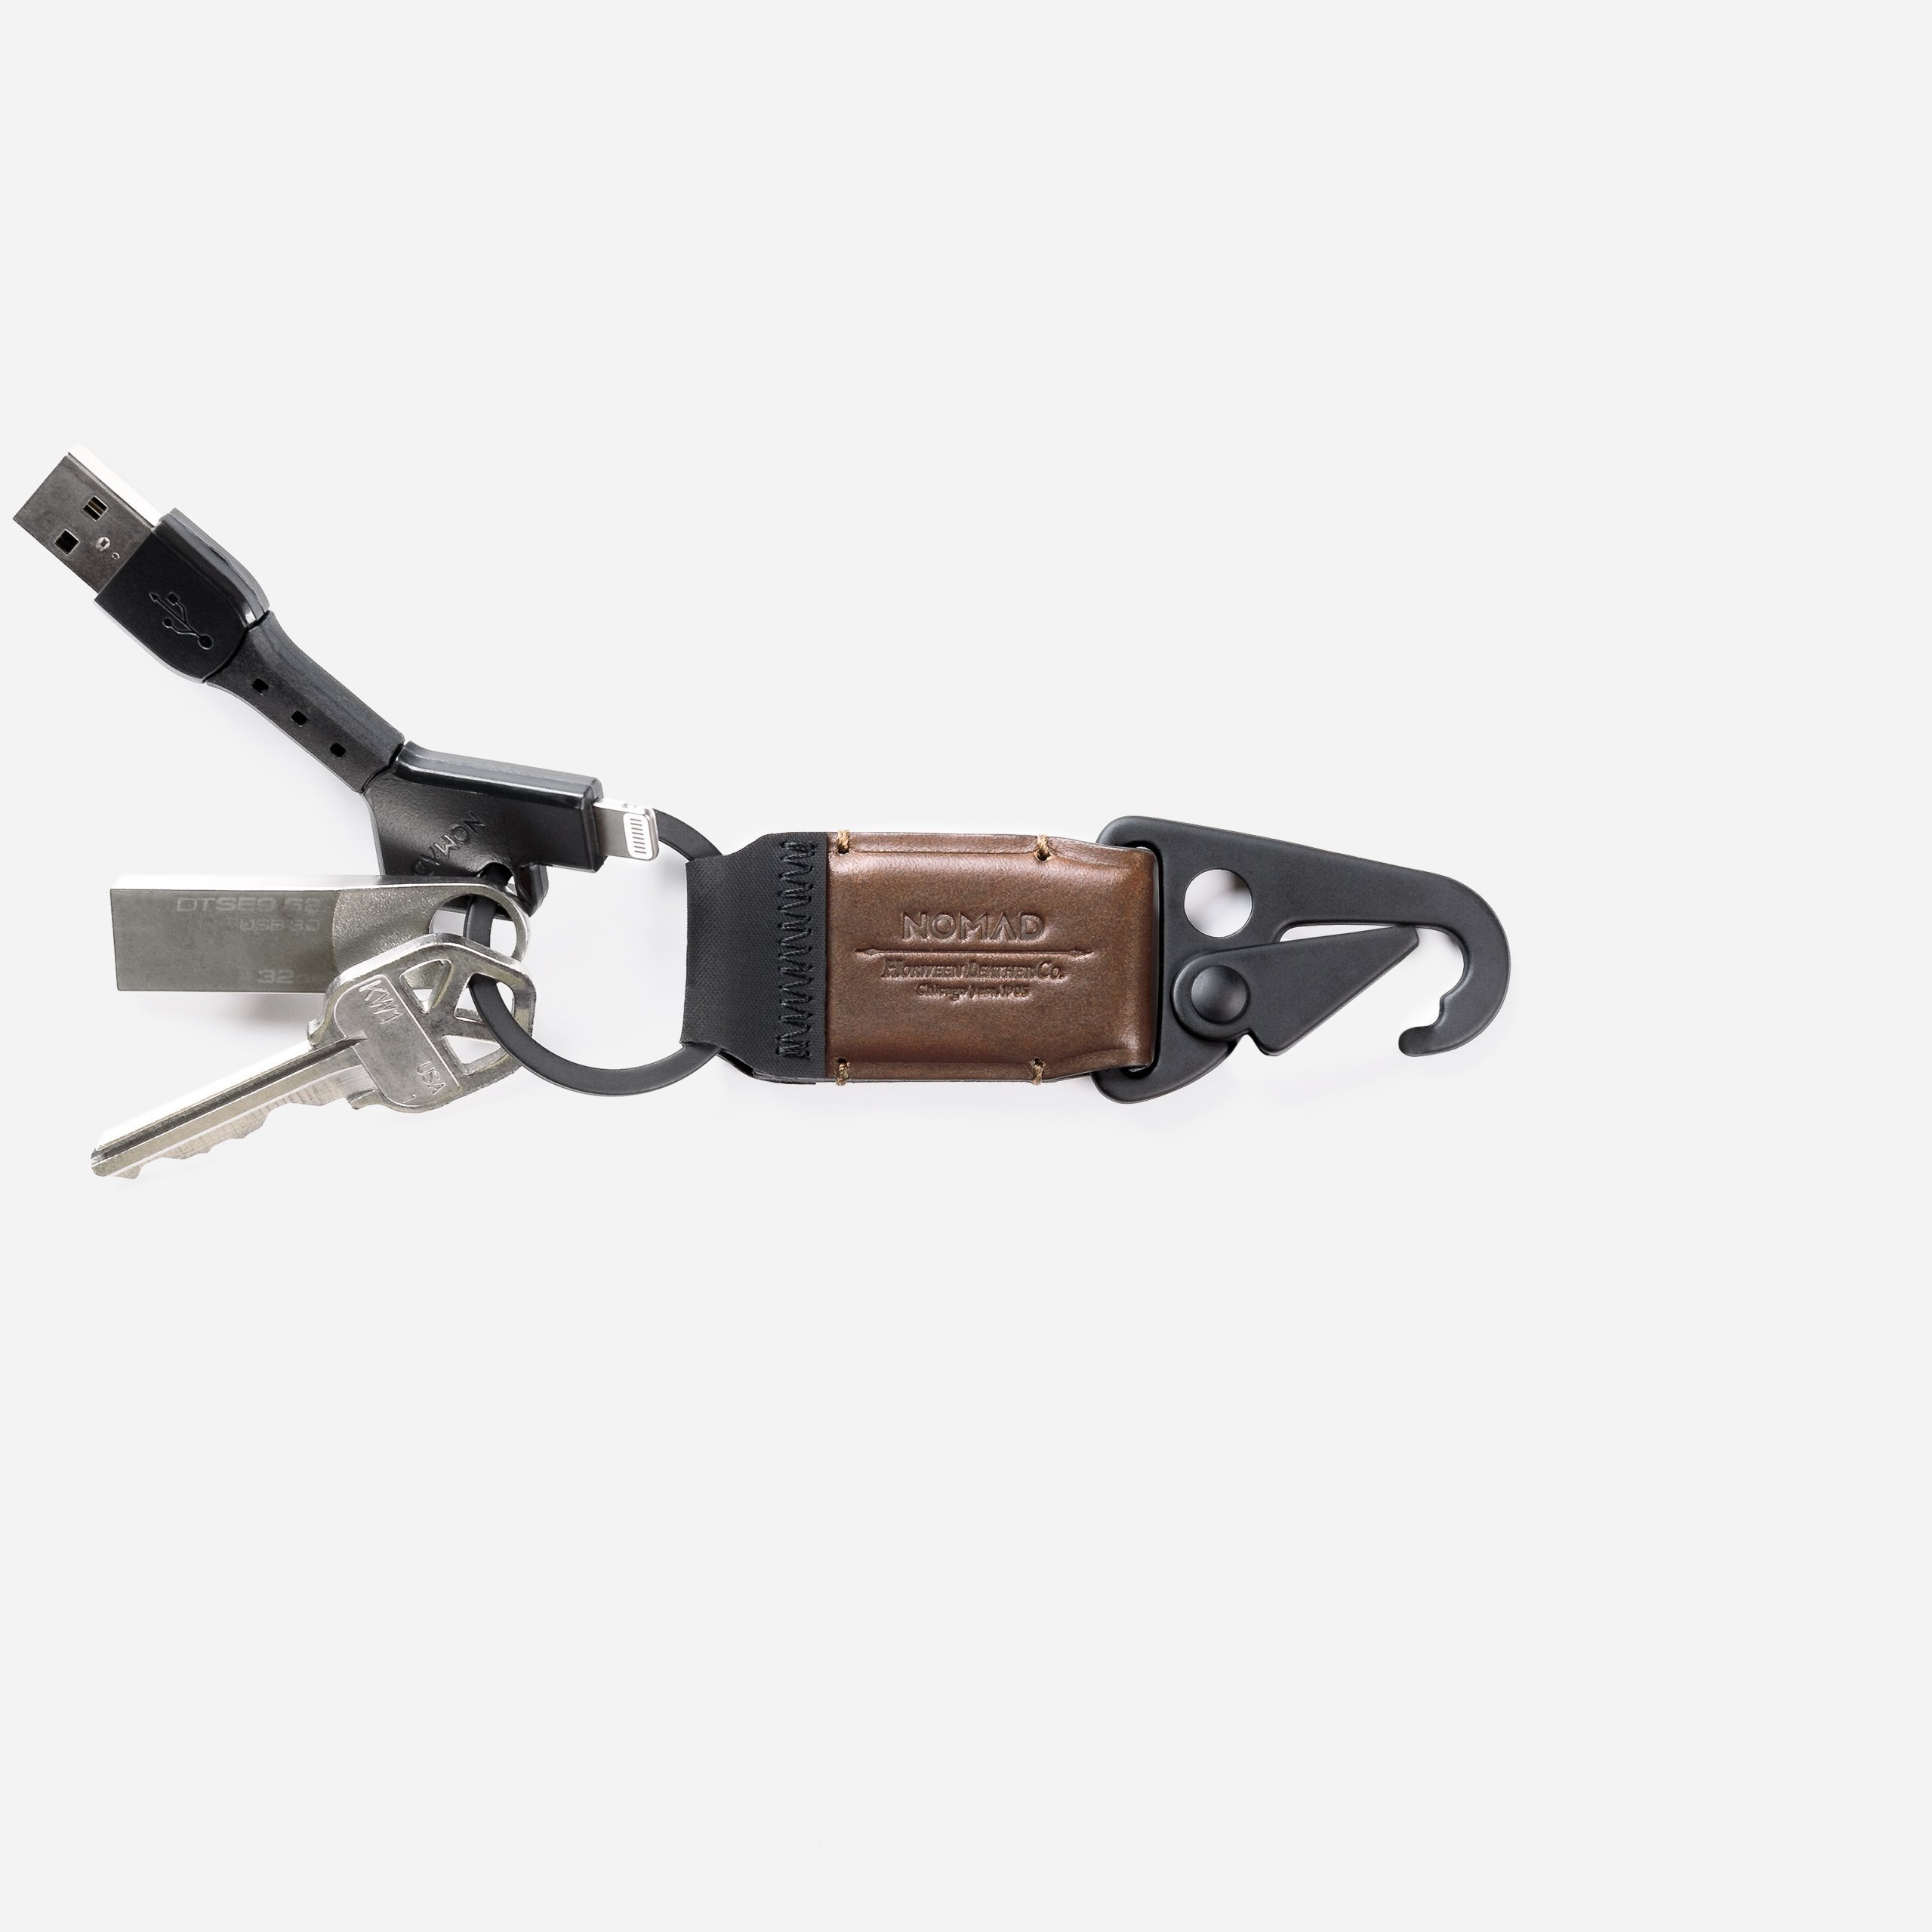 Leather Keychain Clip With Keys